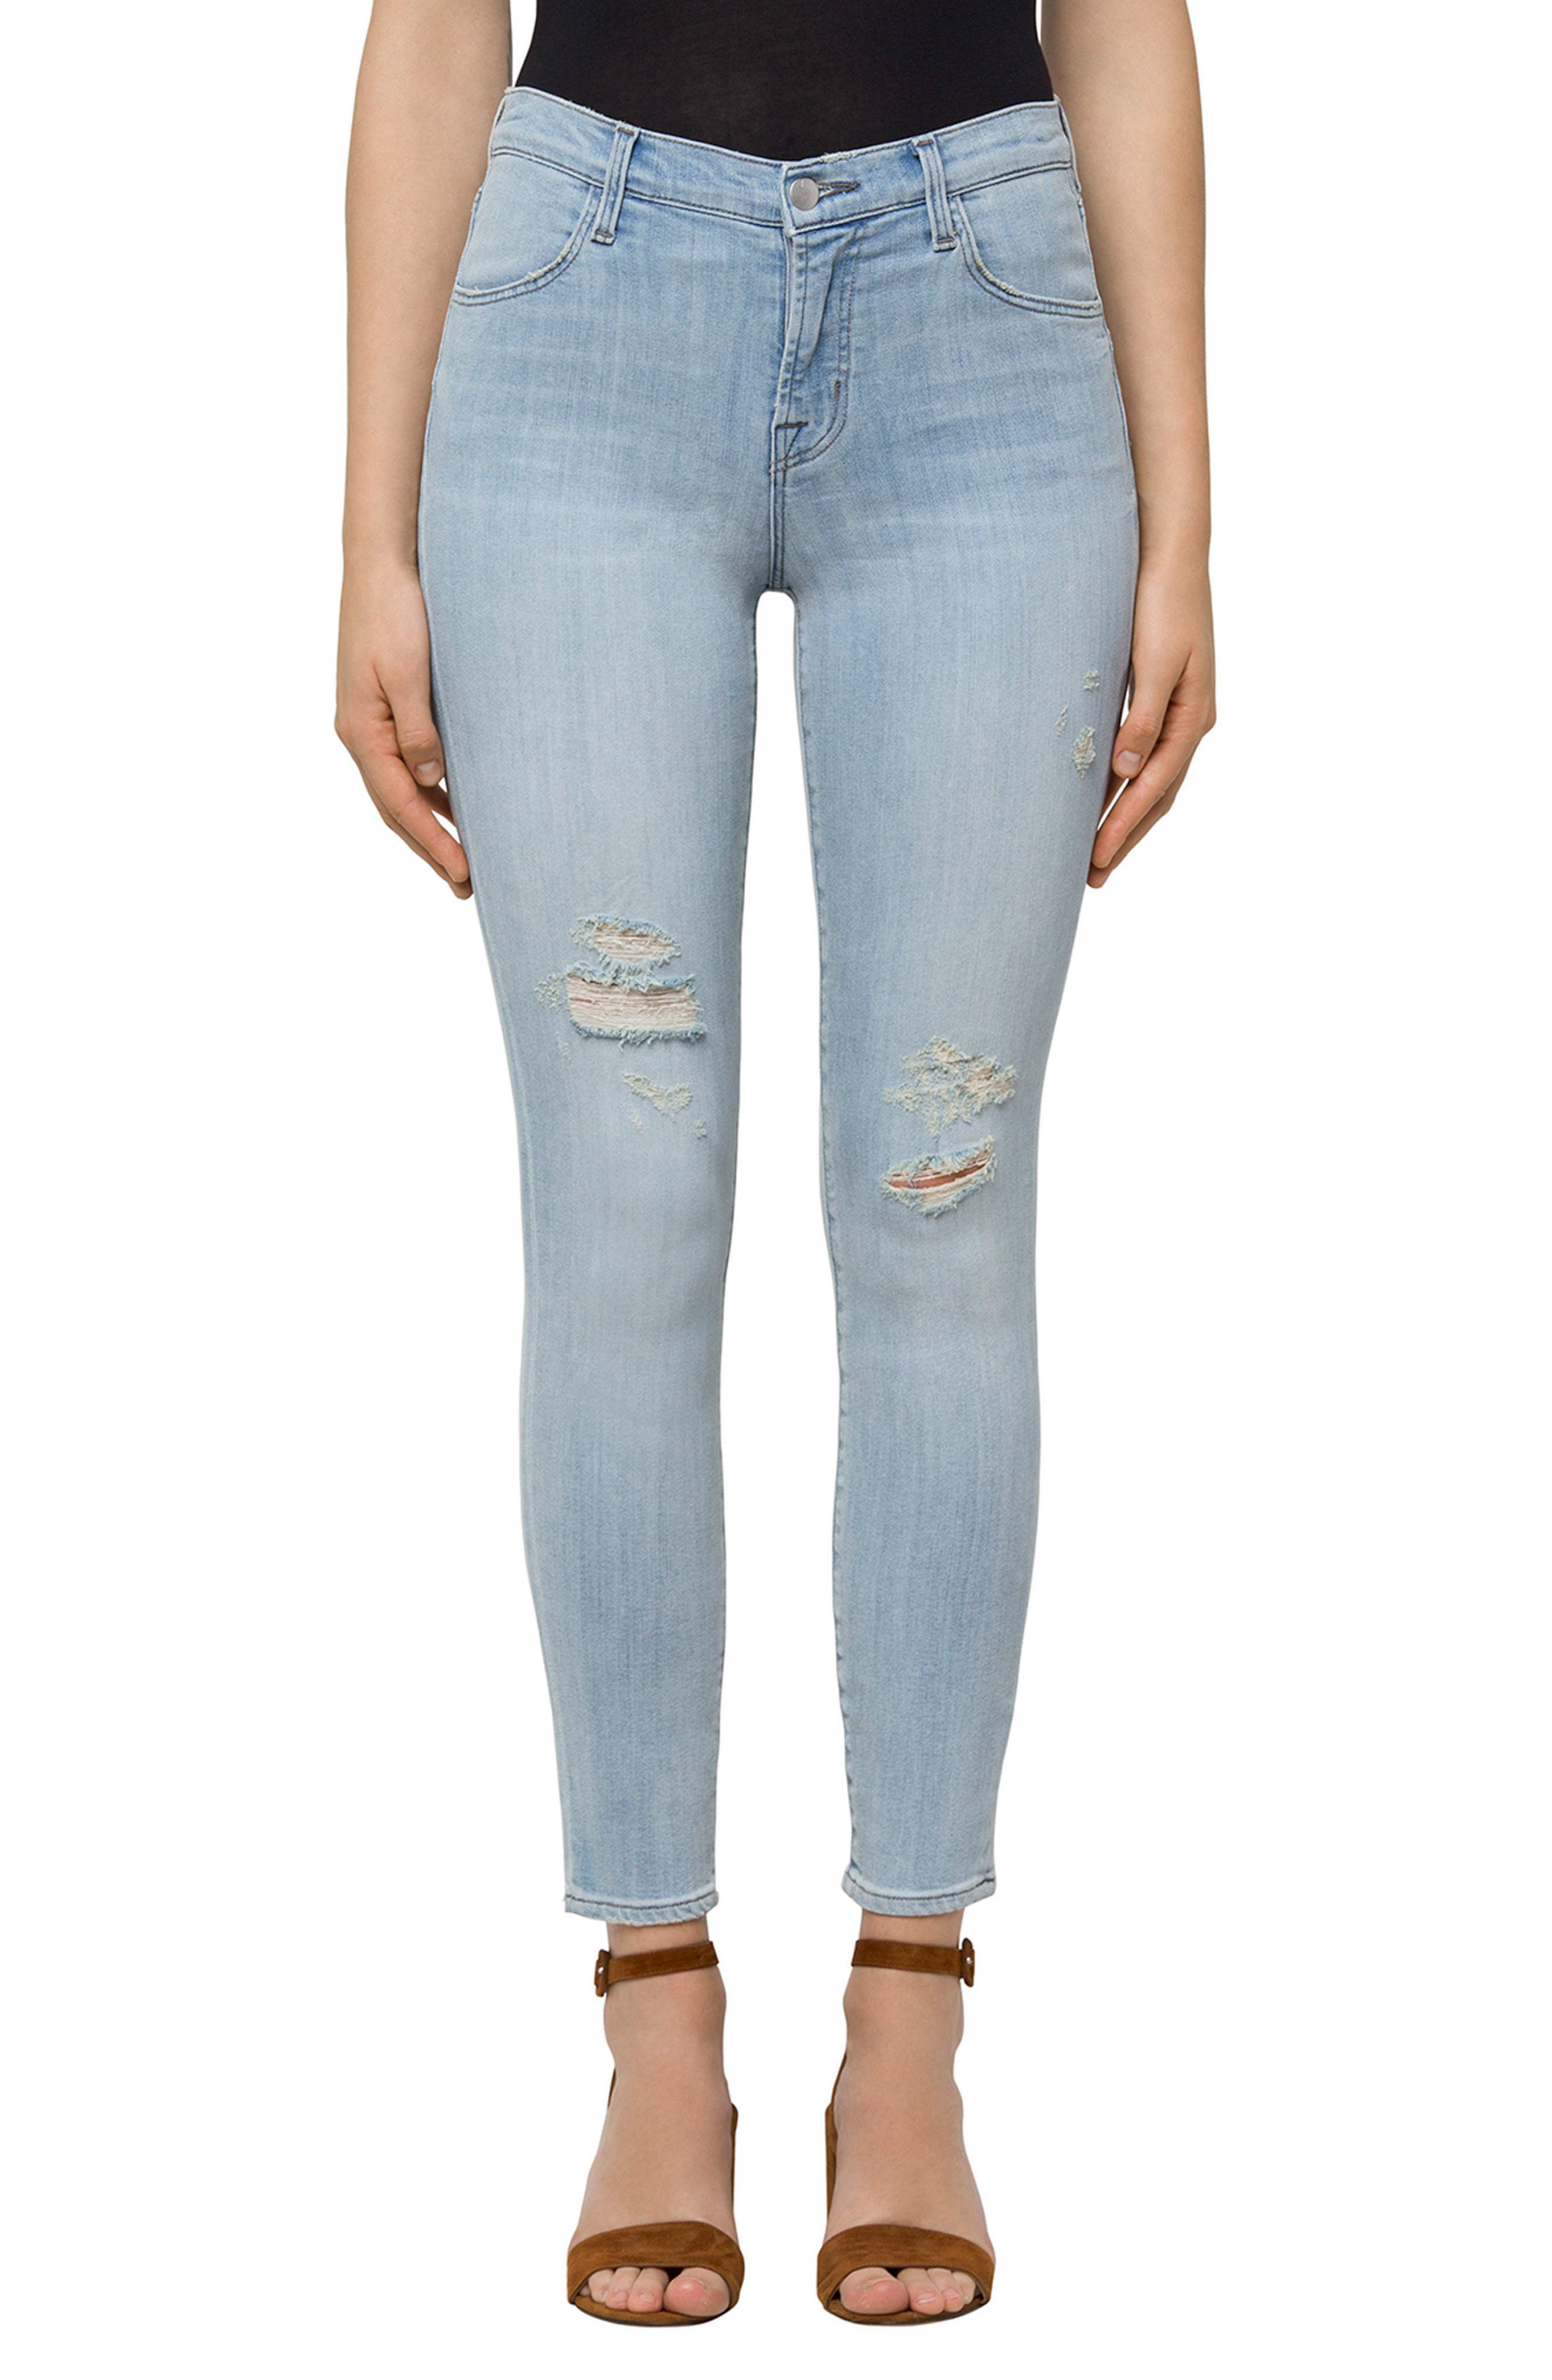 Alana High Waist Ankle Skinny Jeans,                         Main,                         color, Refresh Destruct